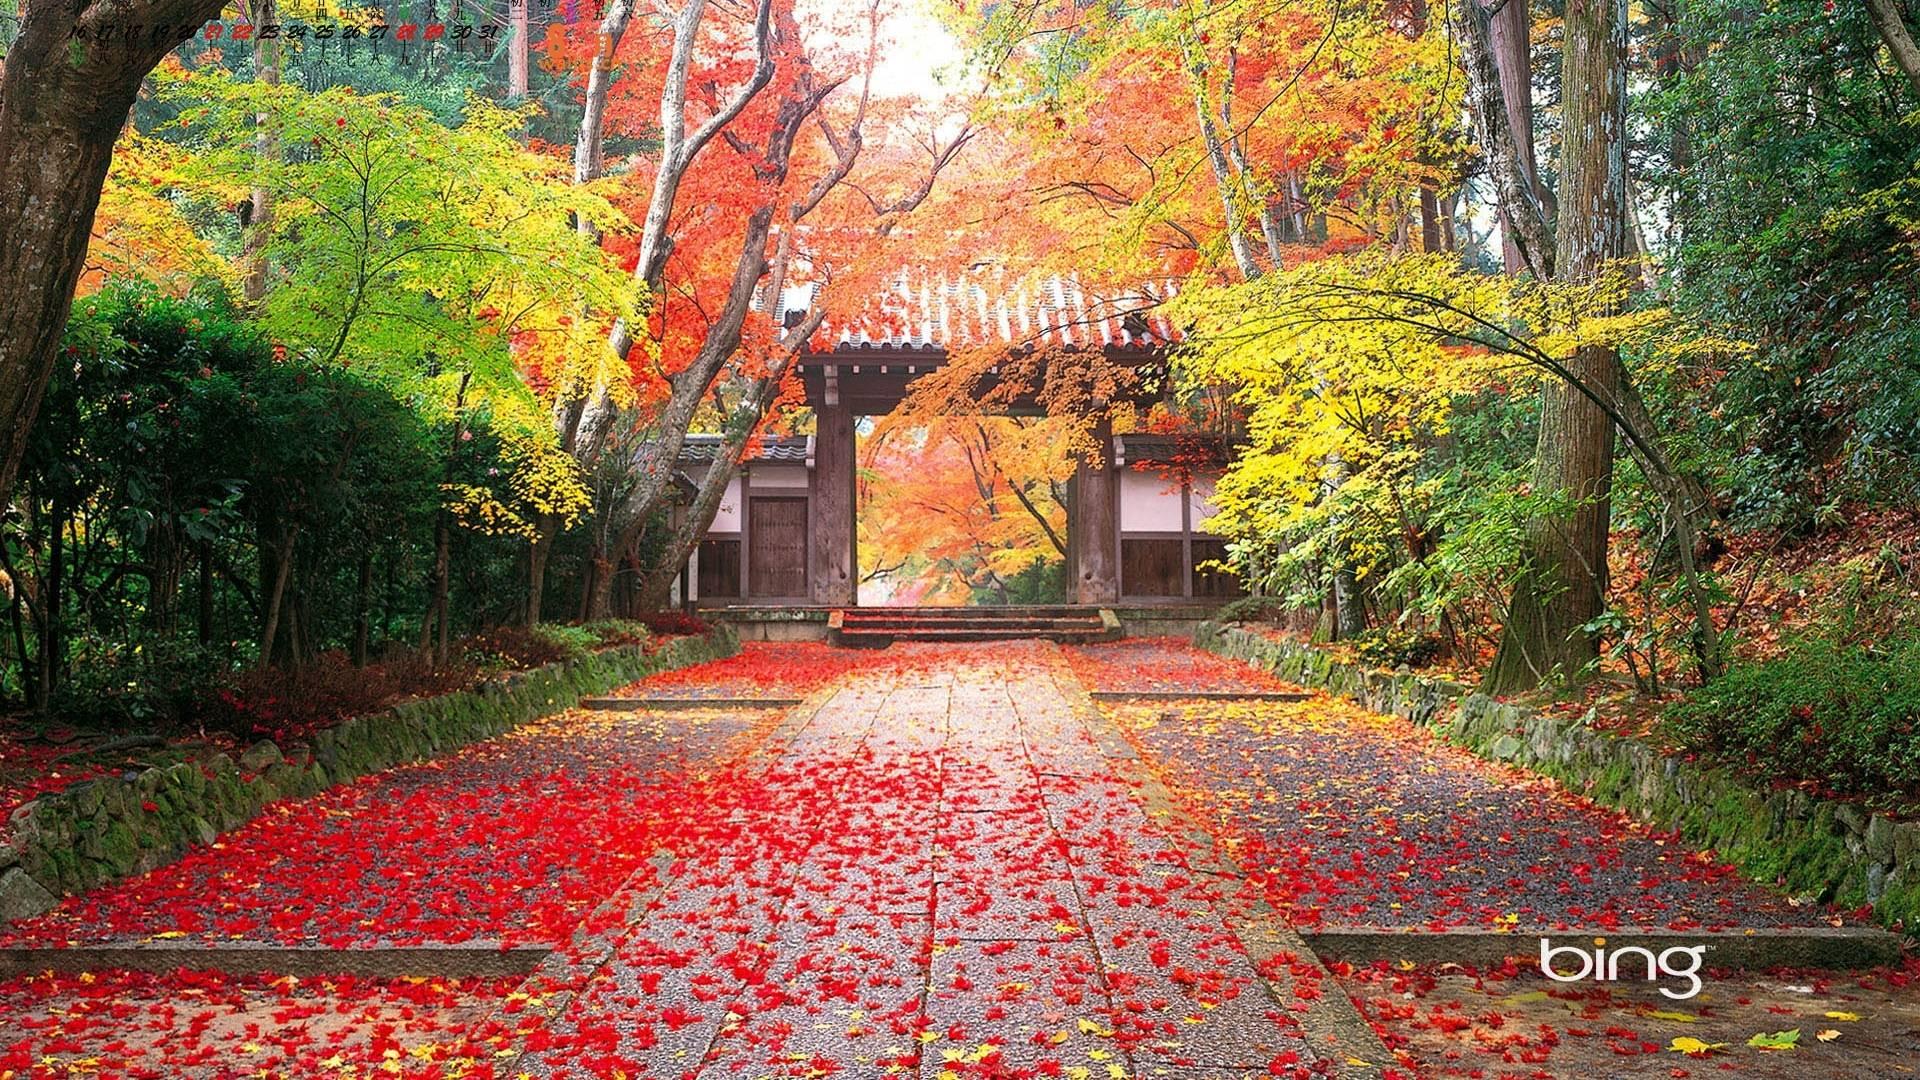 Bing Wallpapers HD 1920x1080